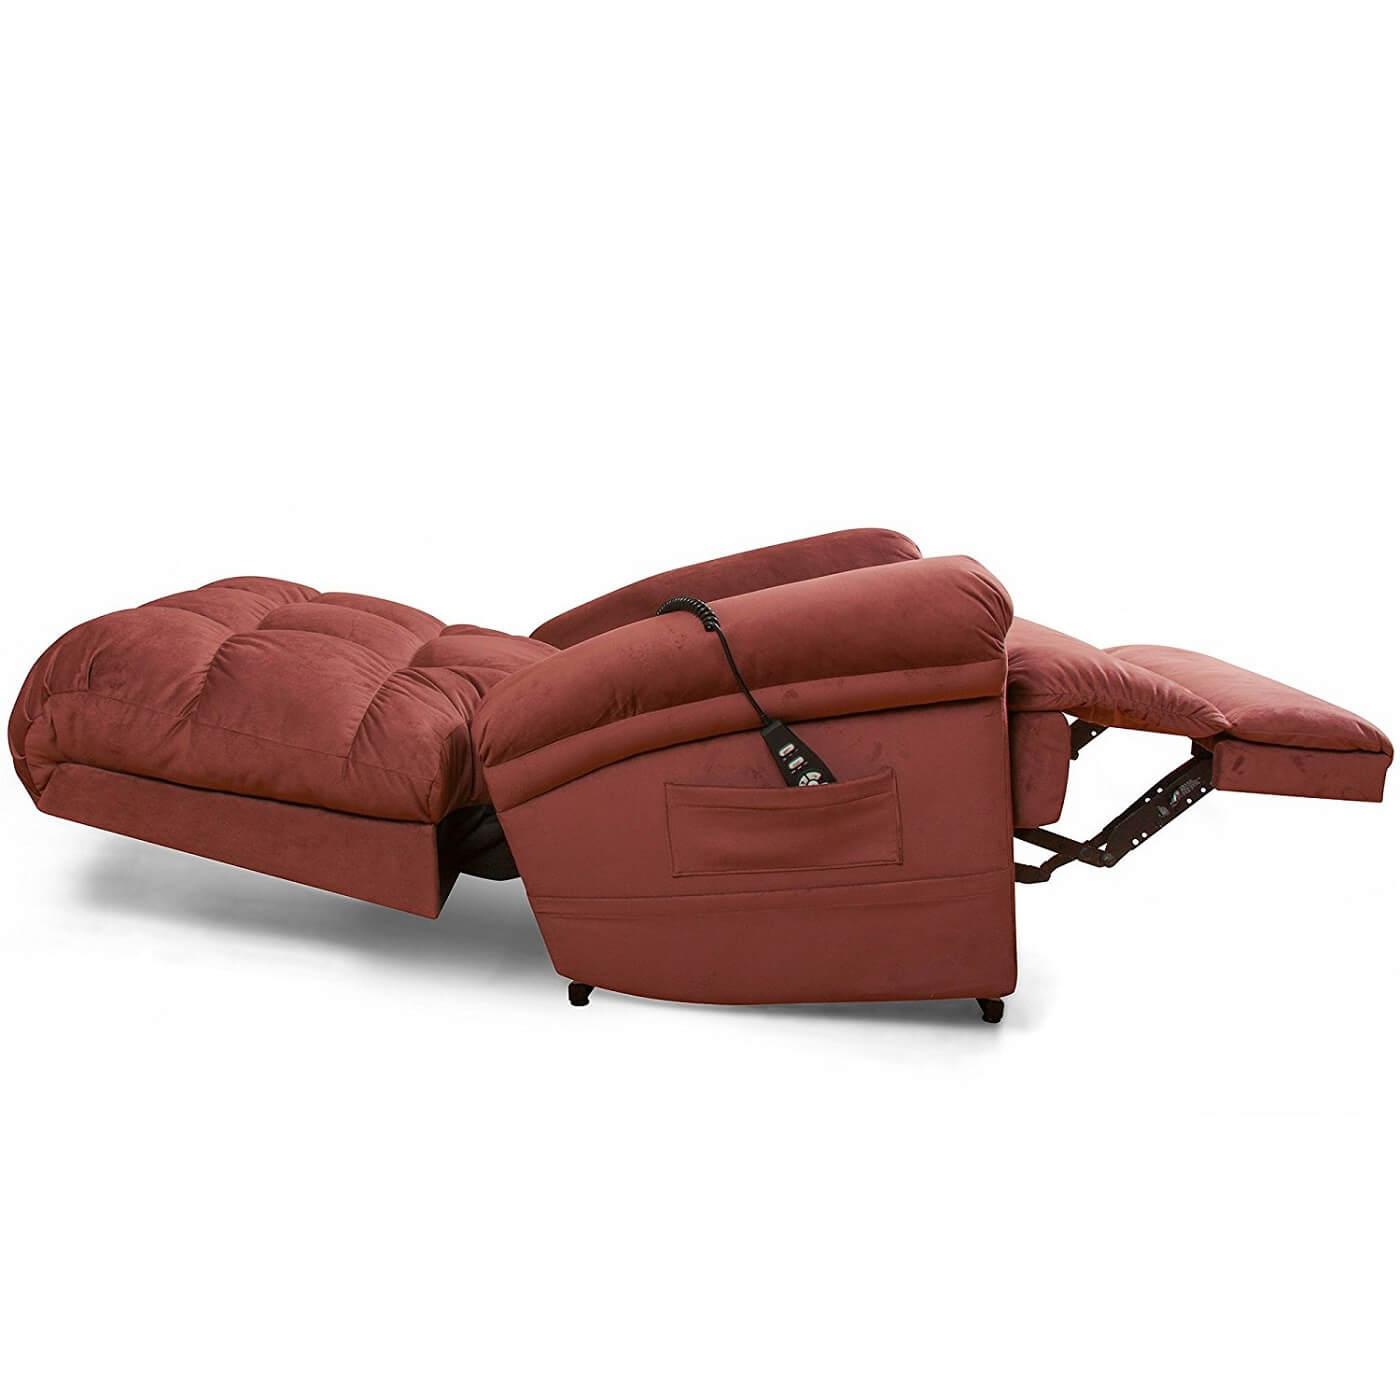 the perfect sleep chair